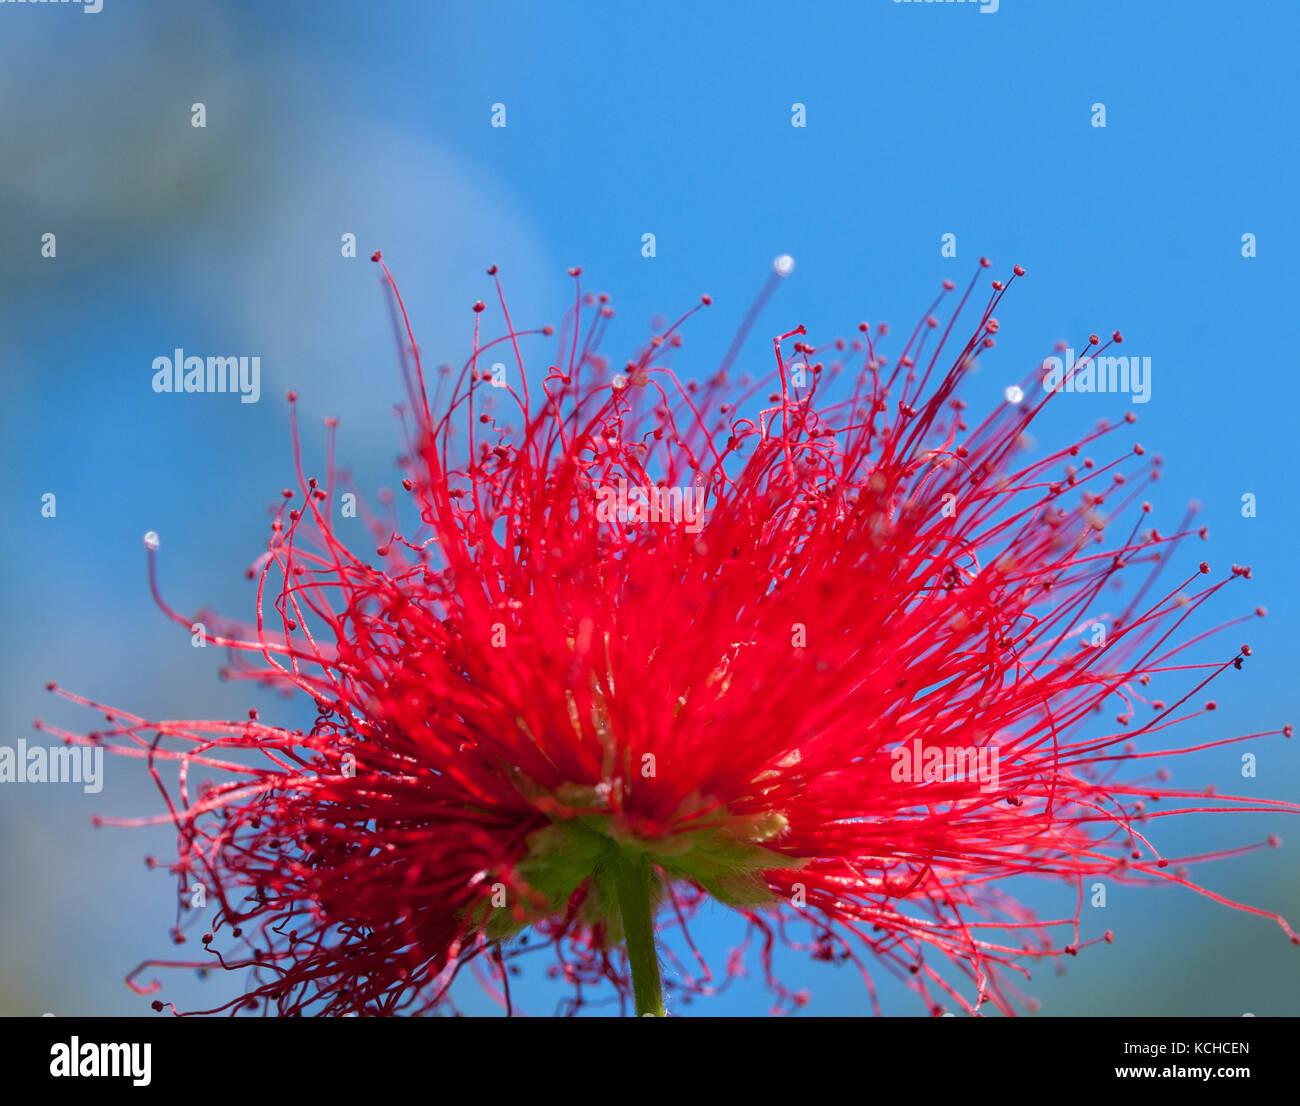 Close Up Crimson Blossoms Of Flower Of Metrosideros Excelsa Also